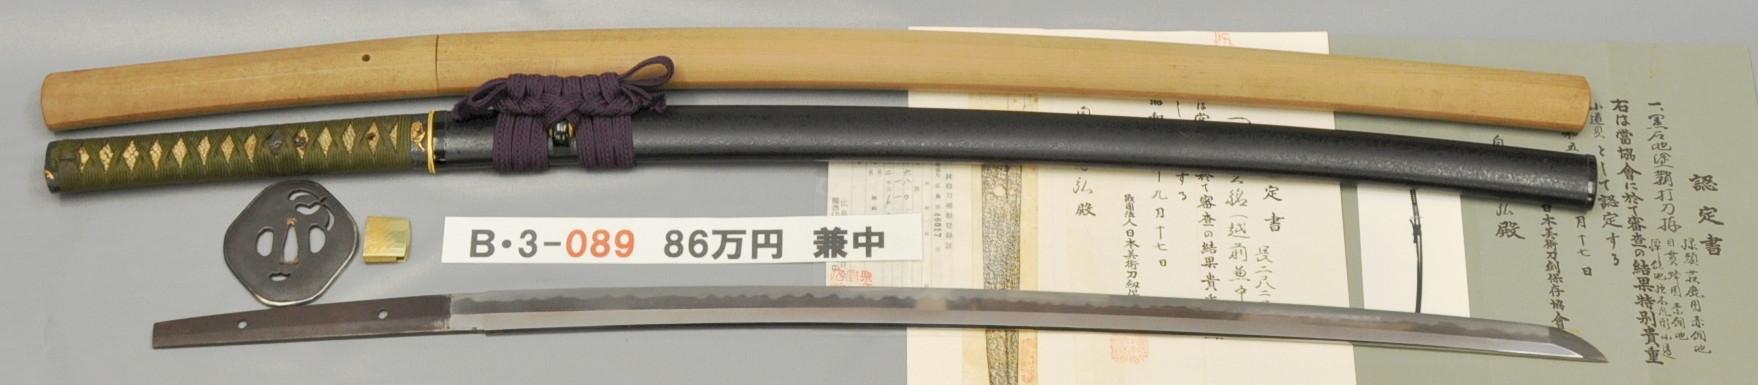 B3089